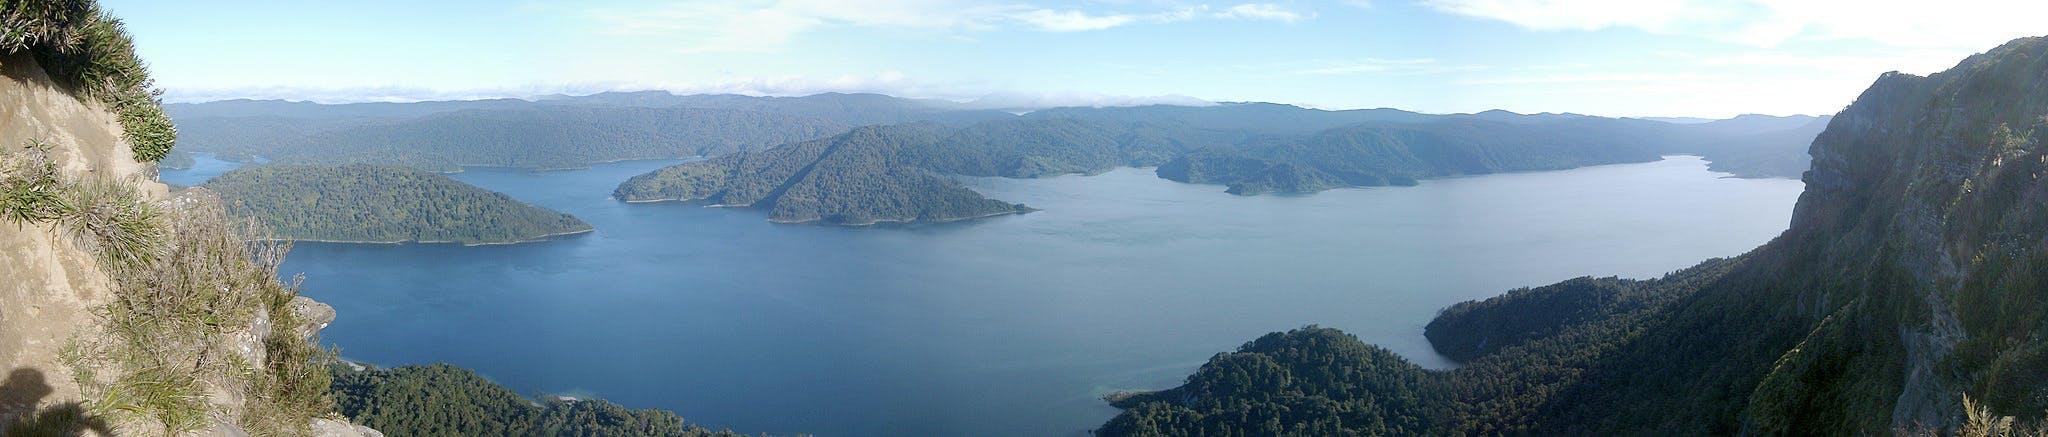 lake waikaremoana - great new zealand walks